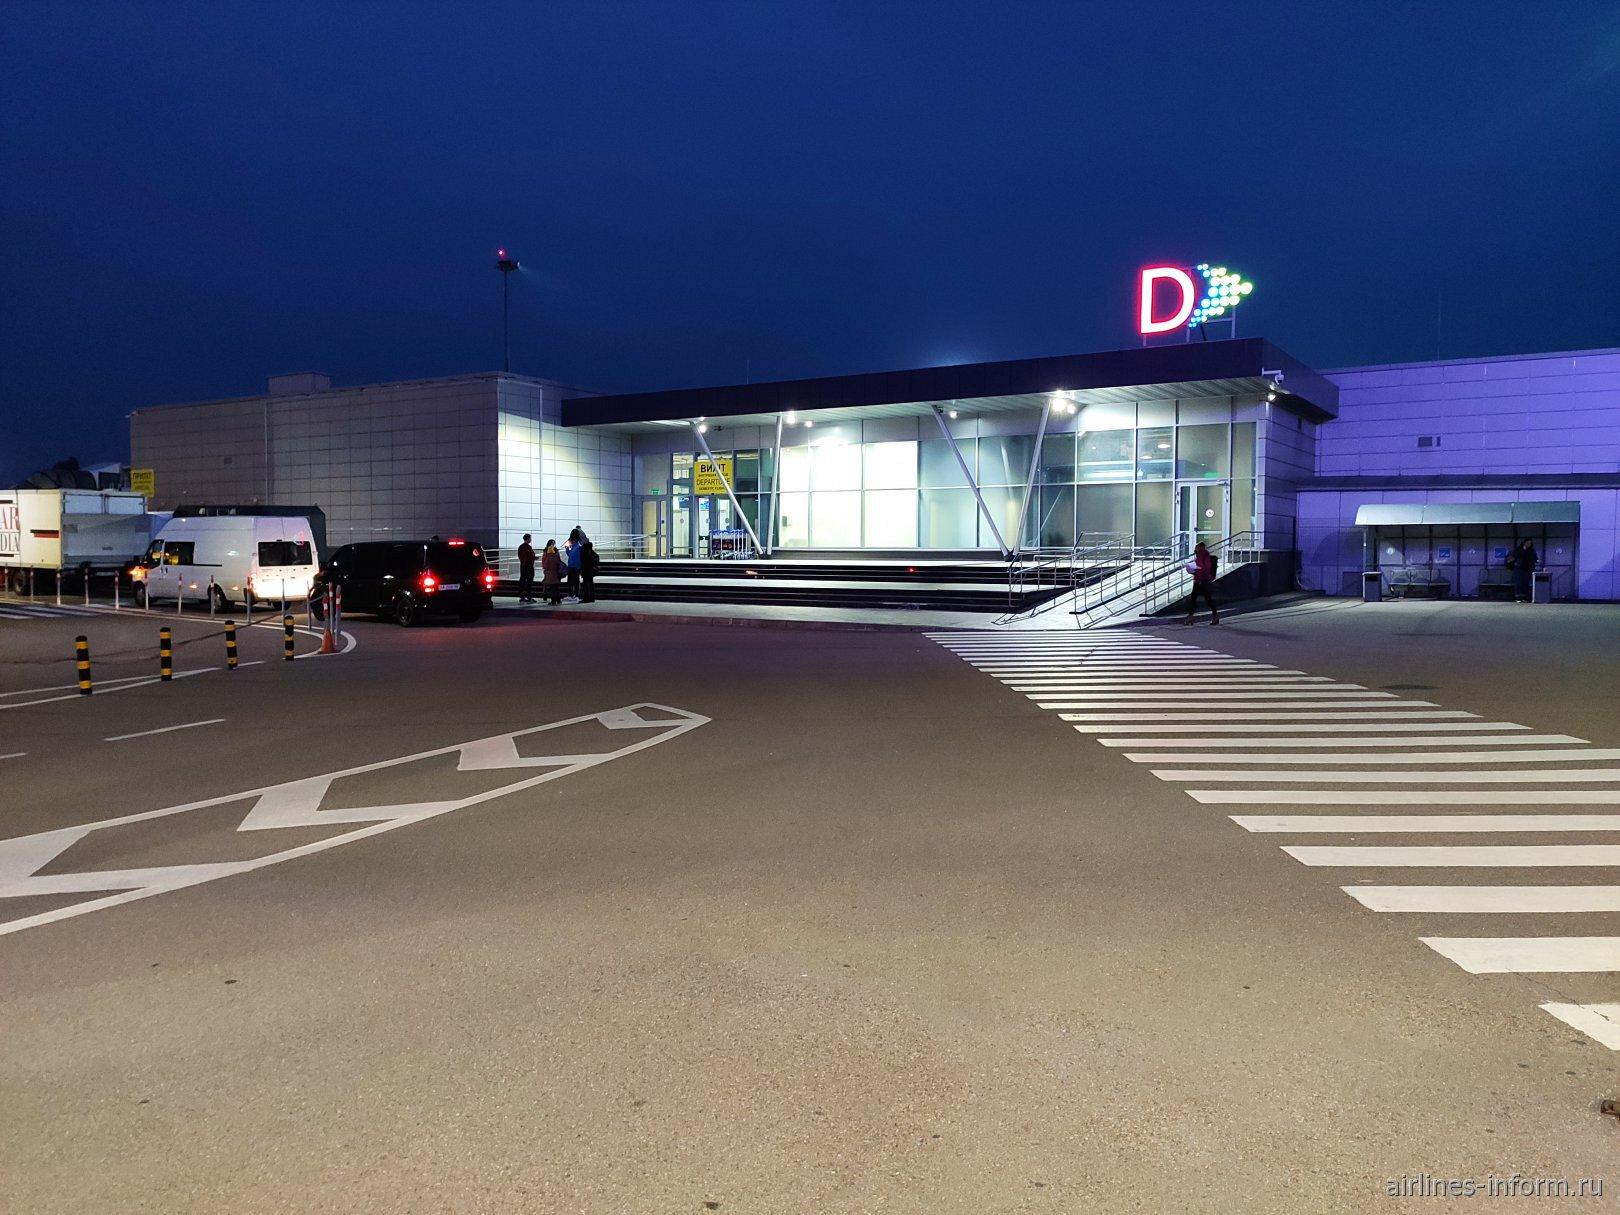 Терминал D аэропорта Киев имени Сикорского